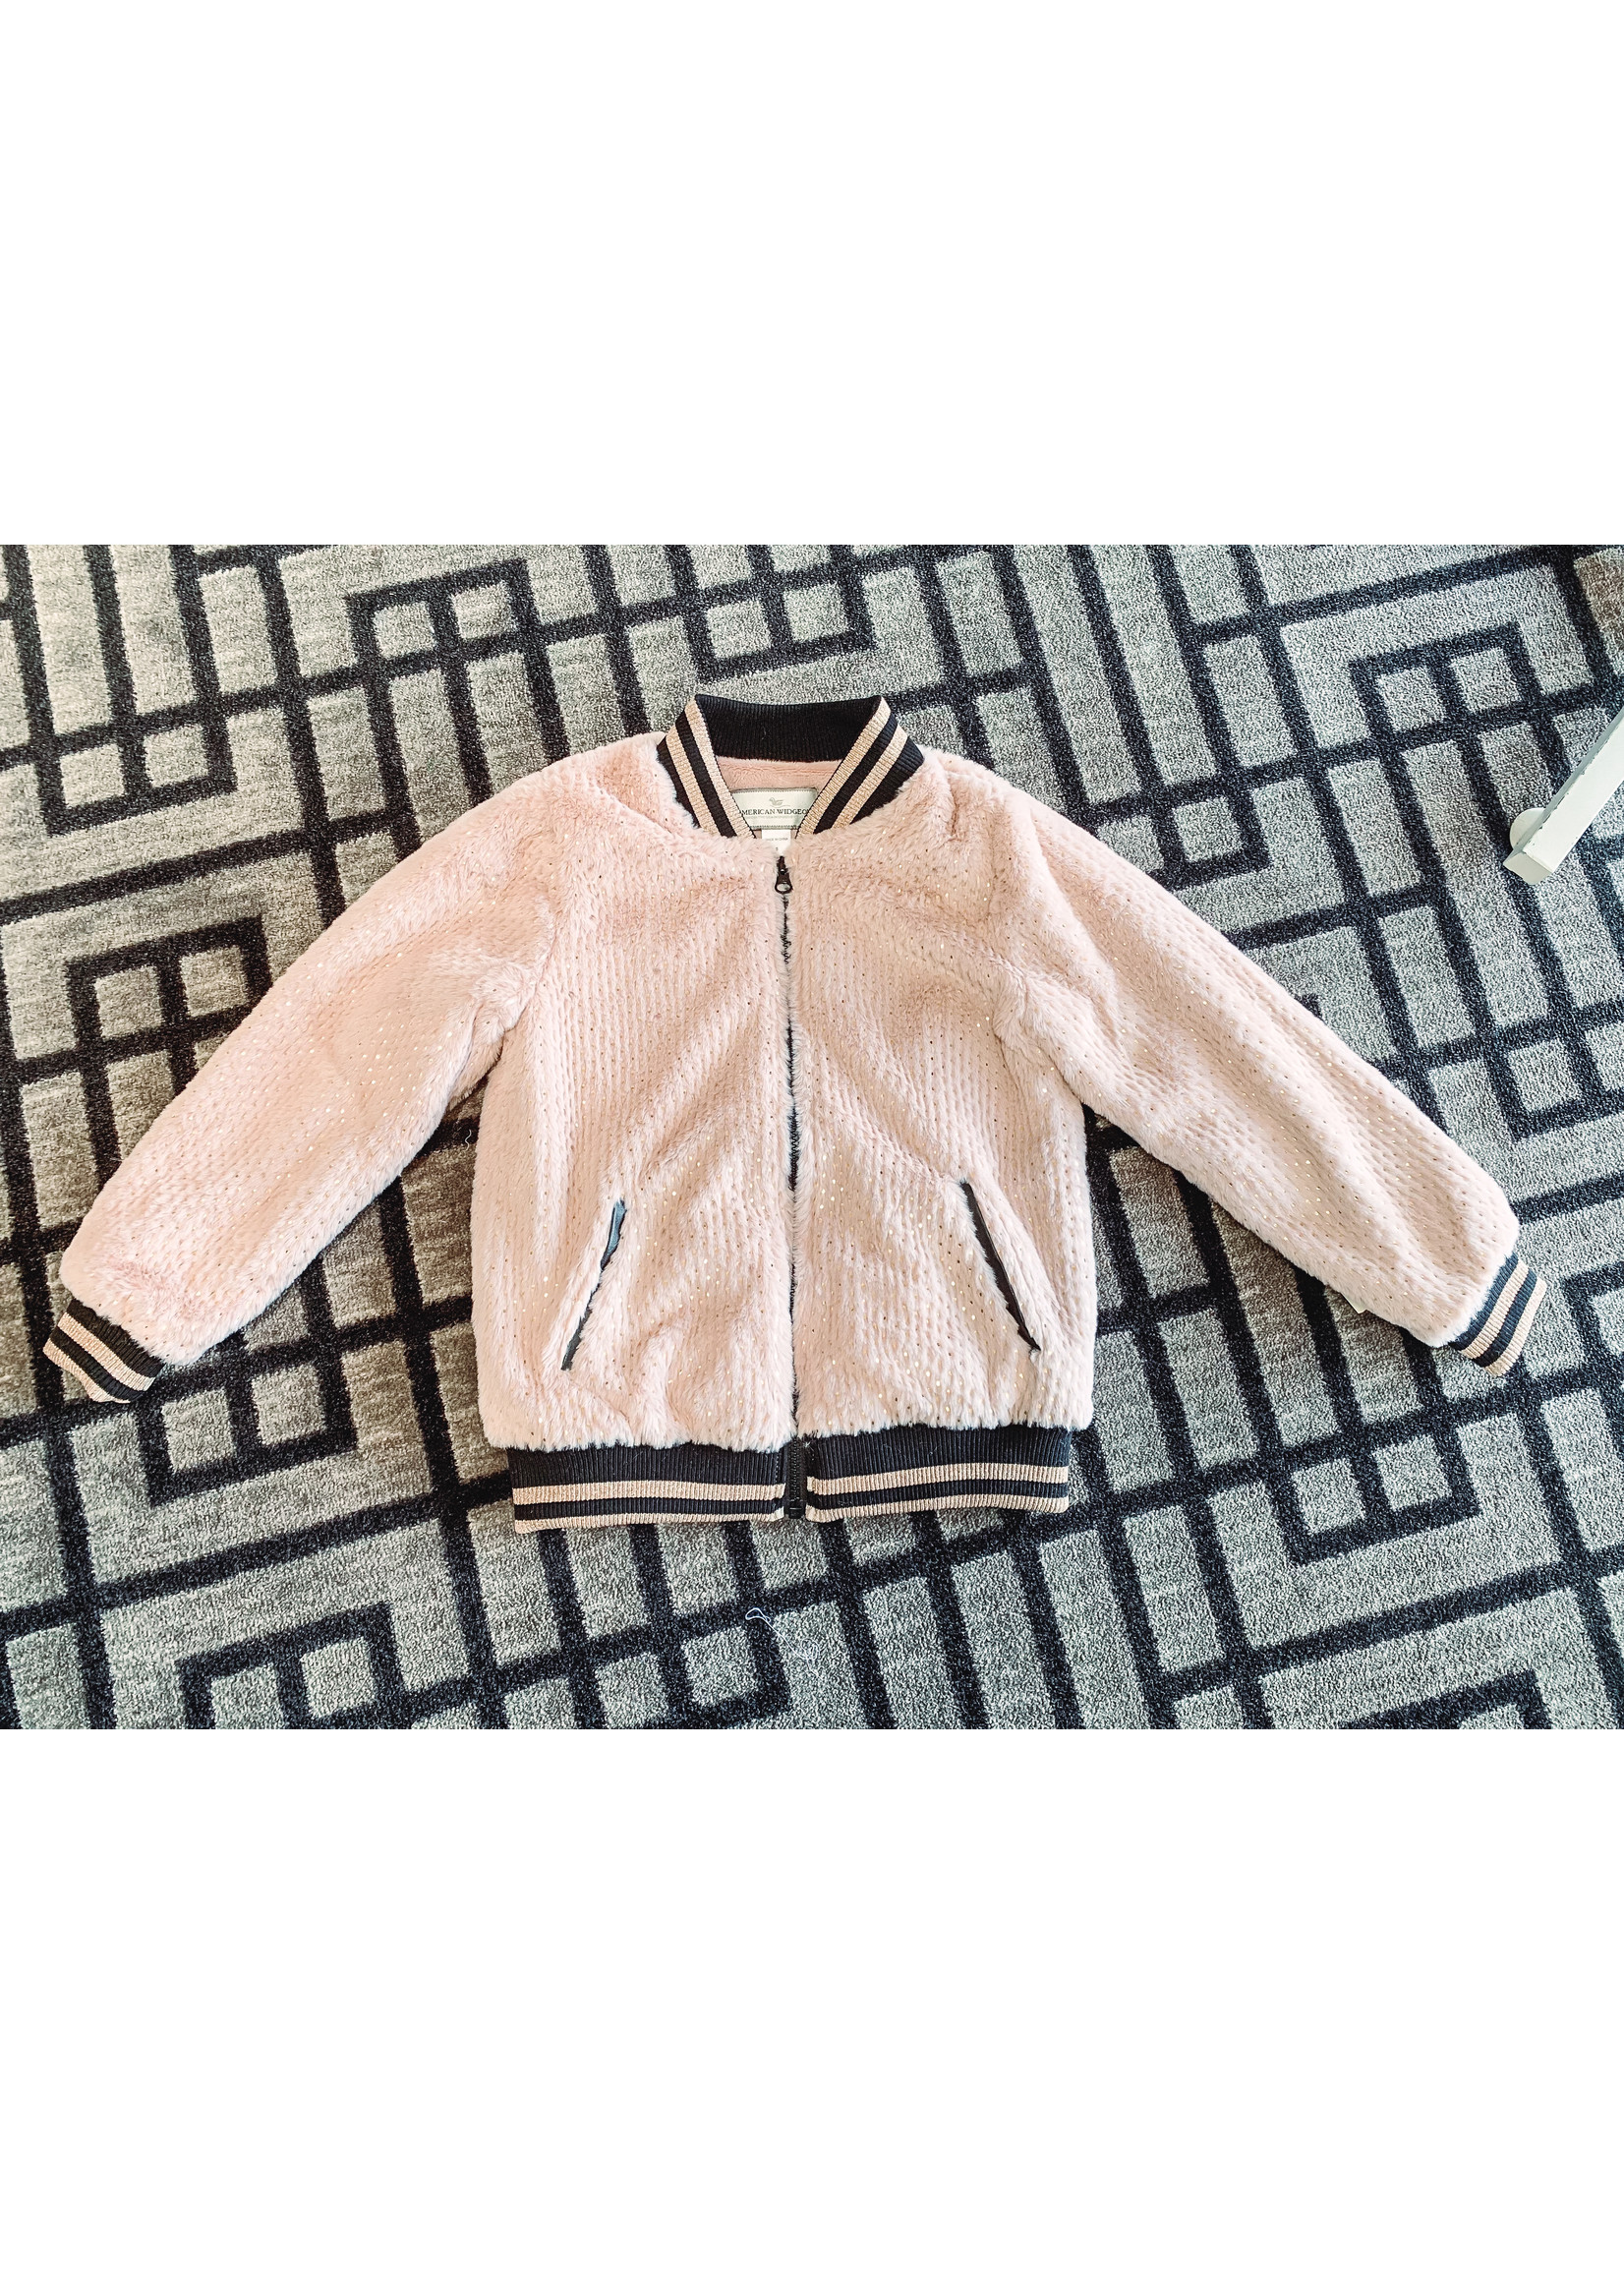 Widgeon Varsity Jacket Rose Gold Foil